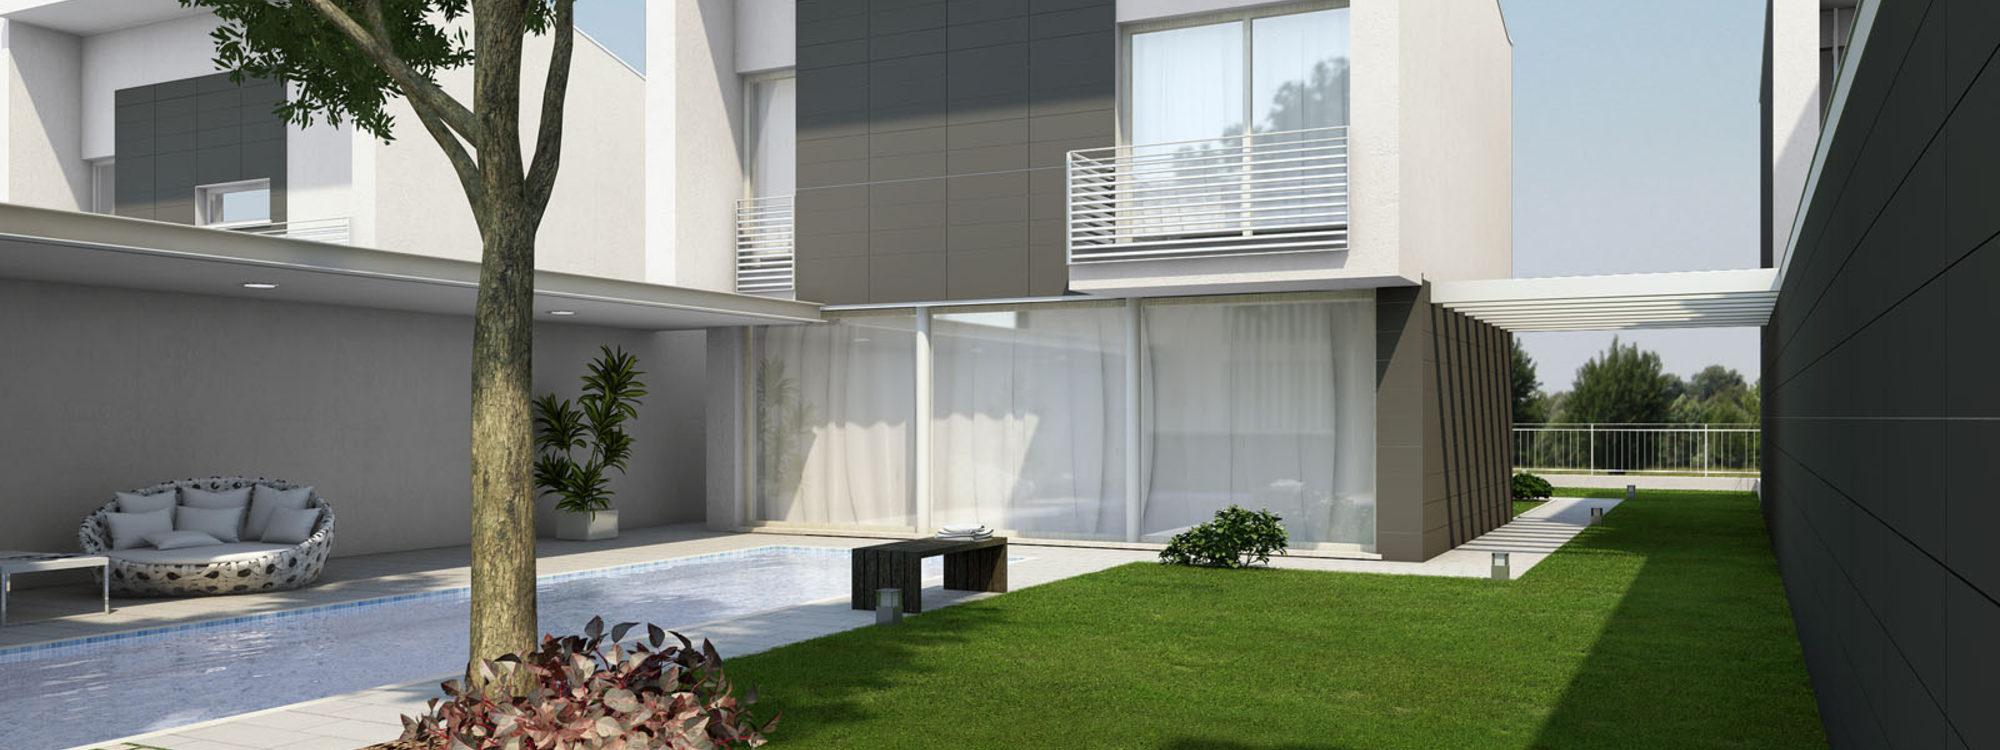 Villa Offsite con piscina